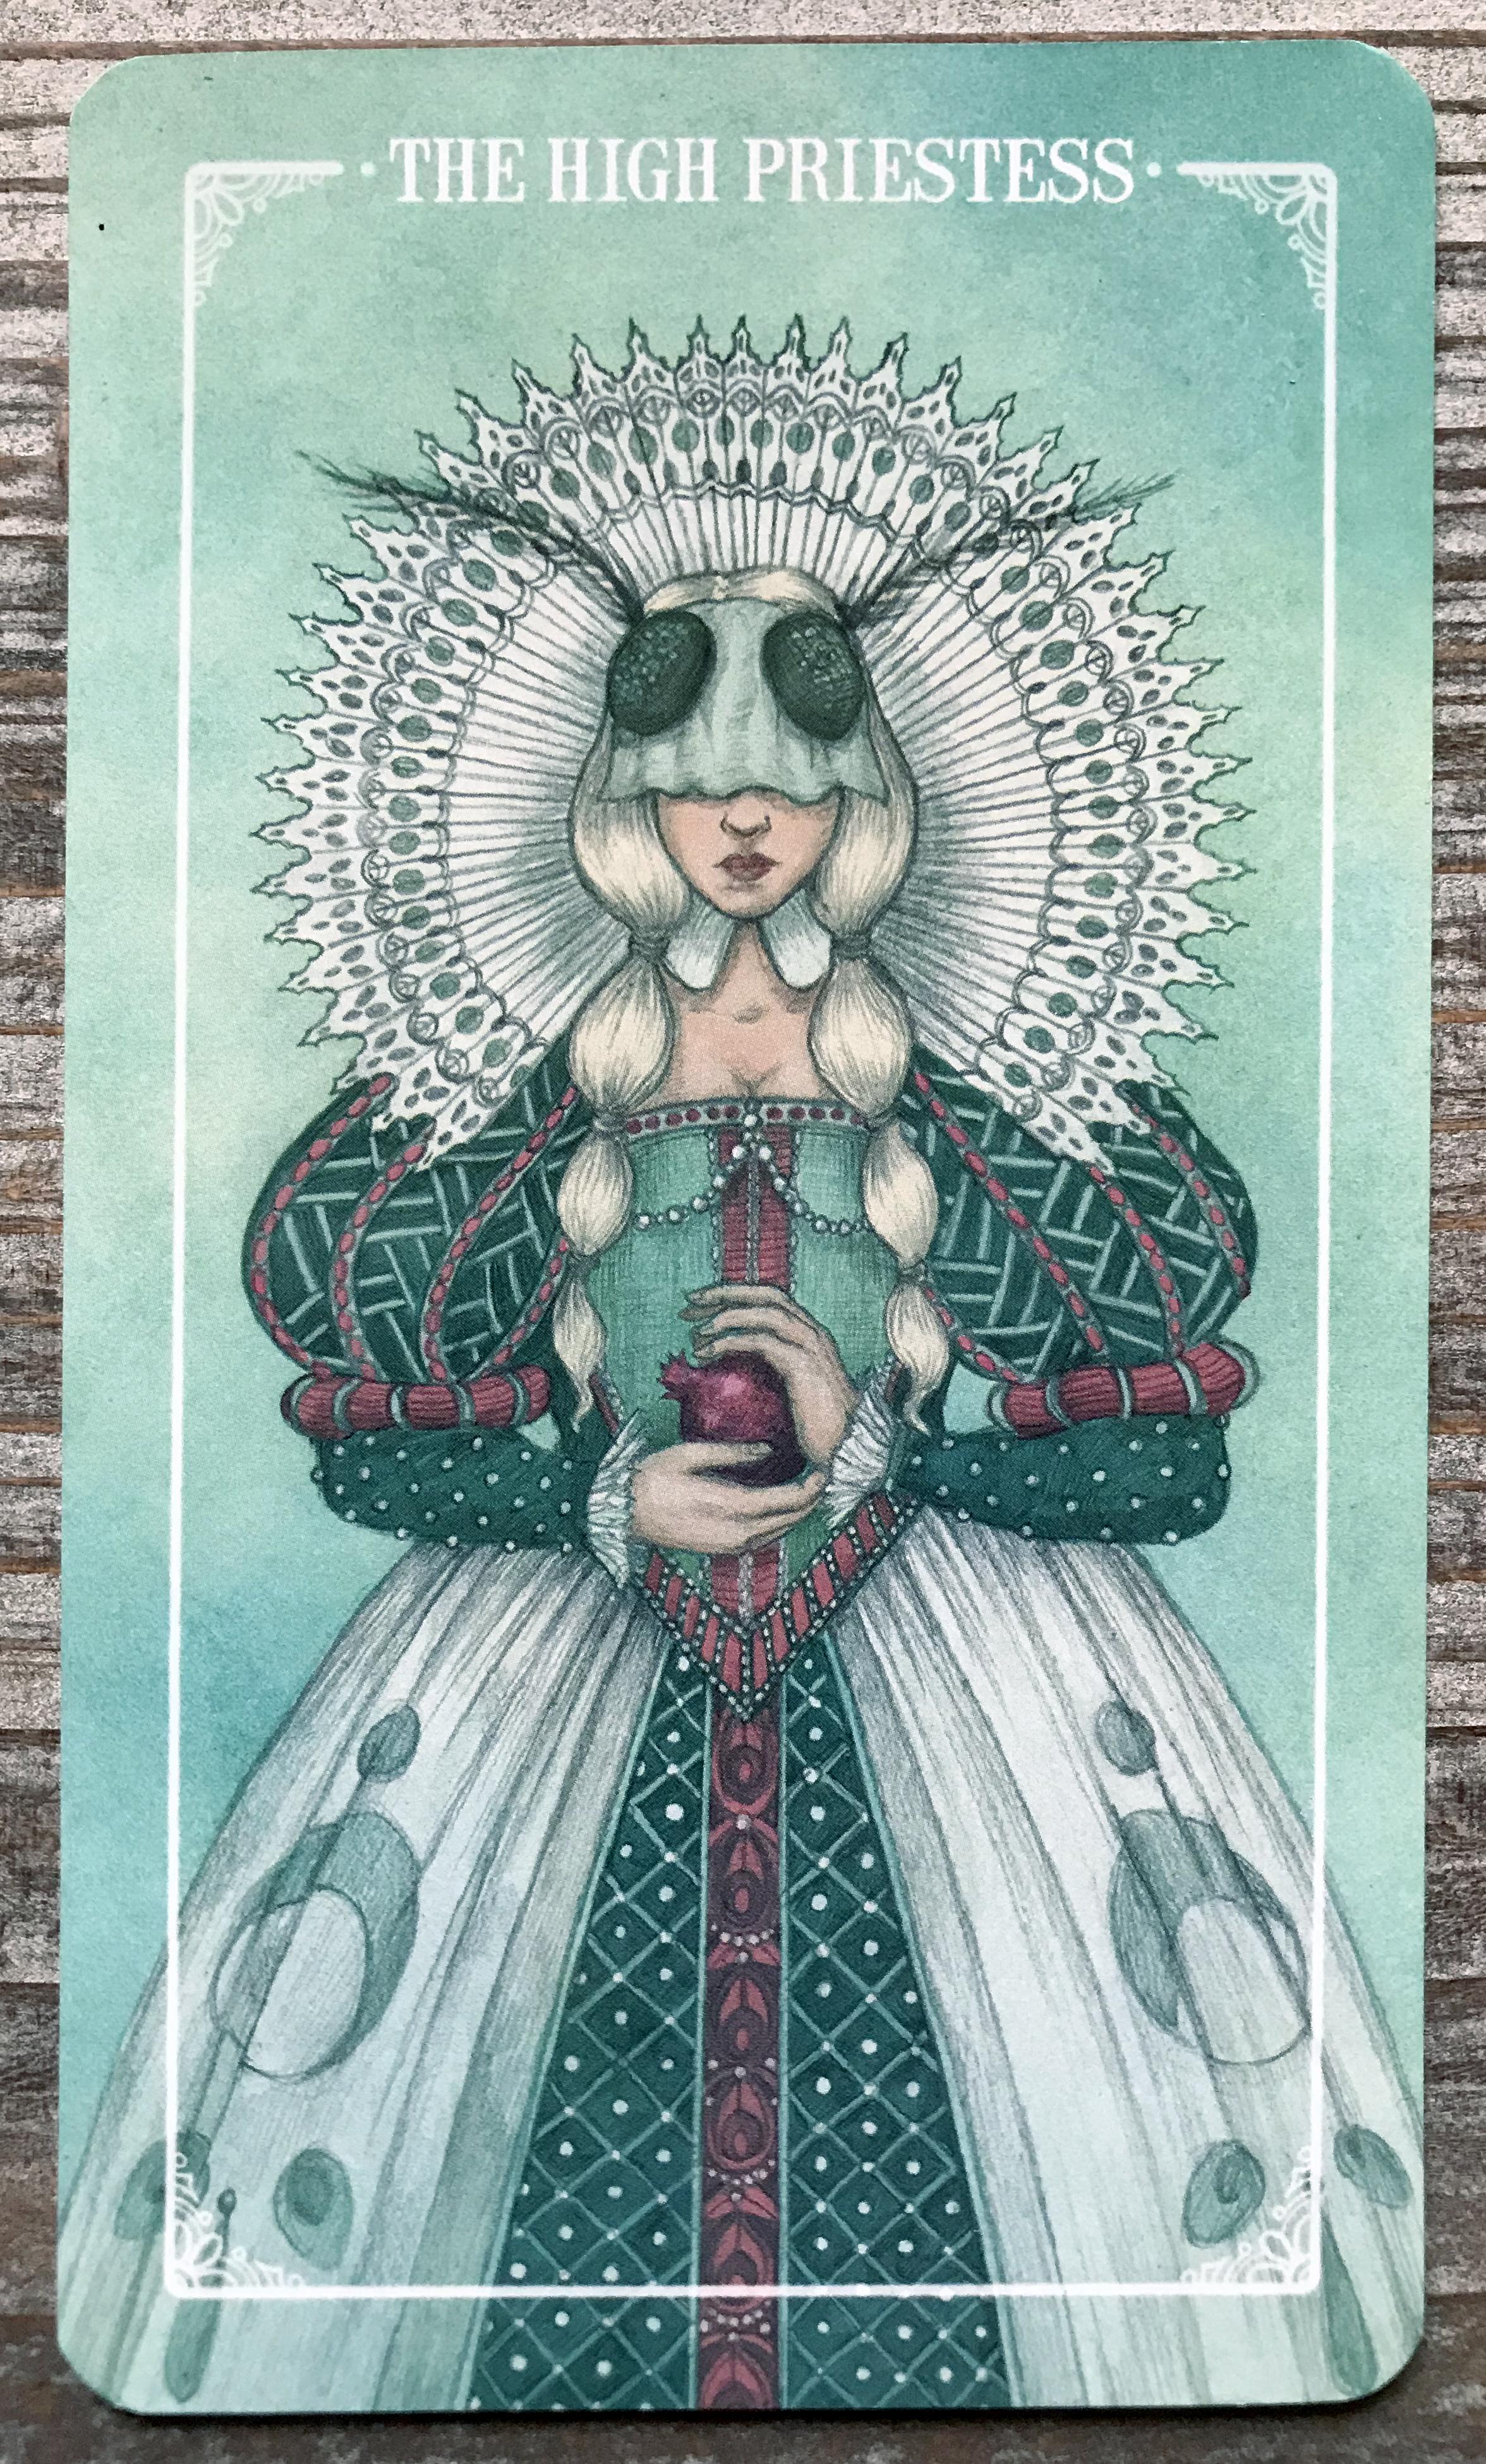 The High Priestess - Ostara Tarot